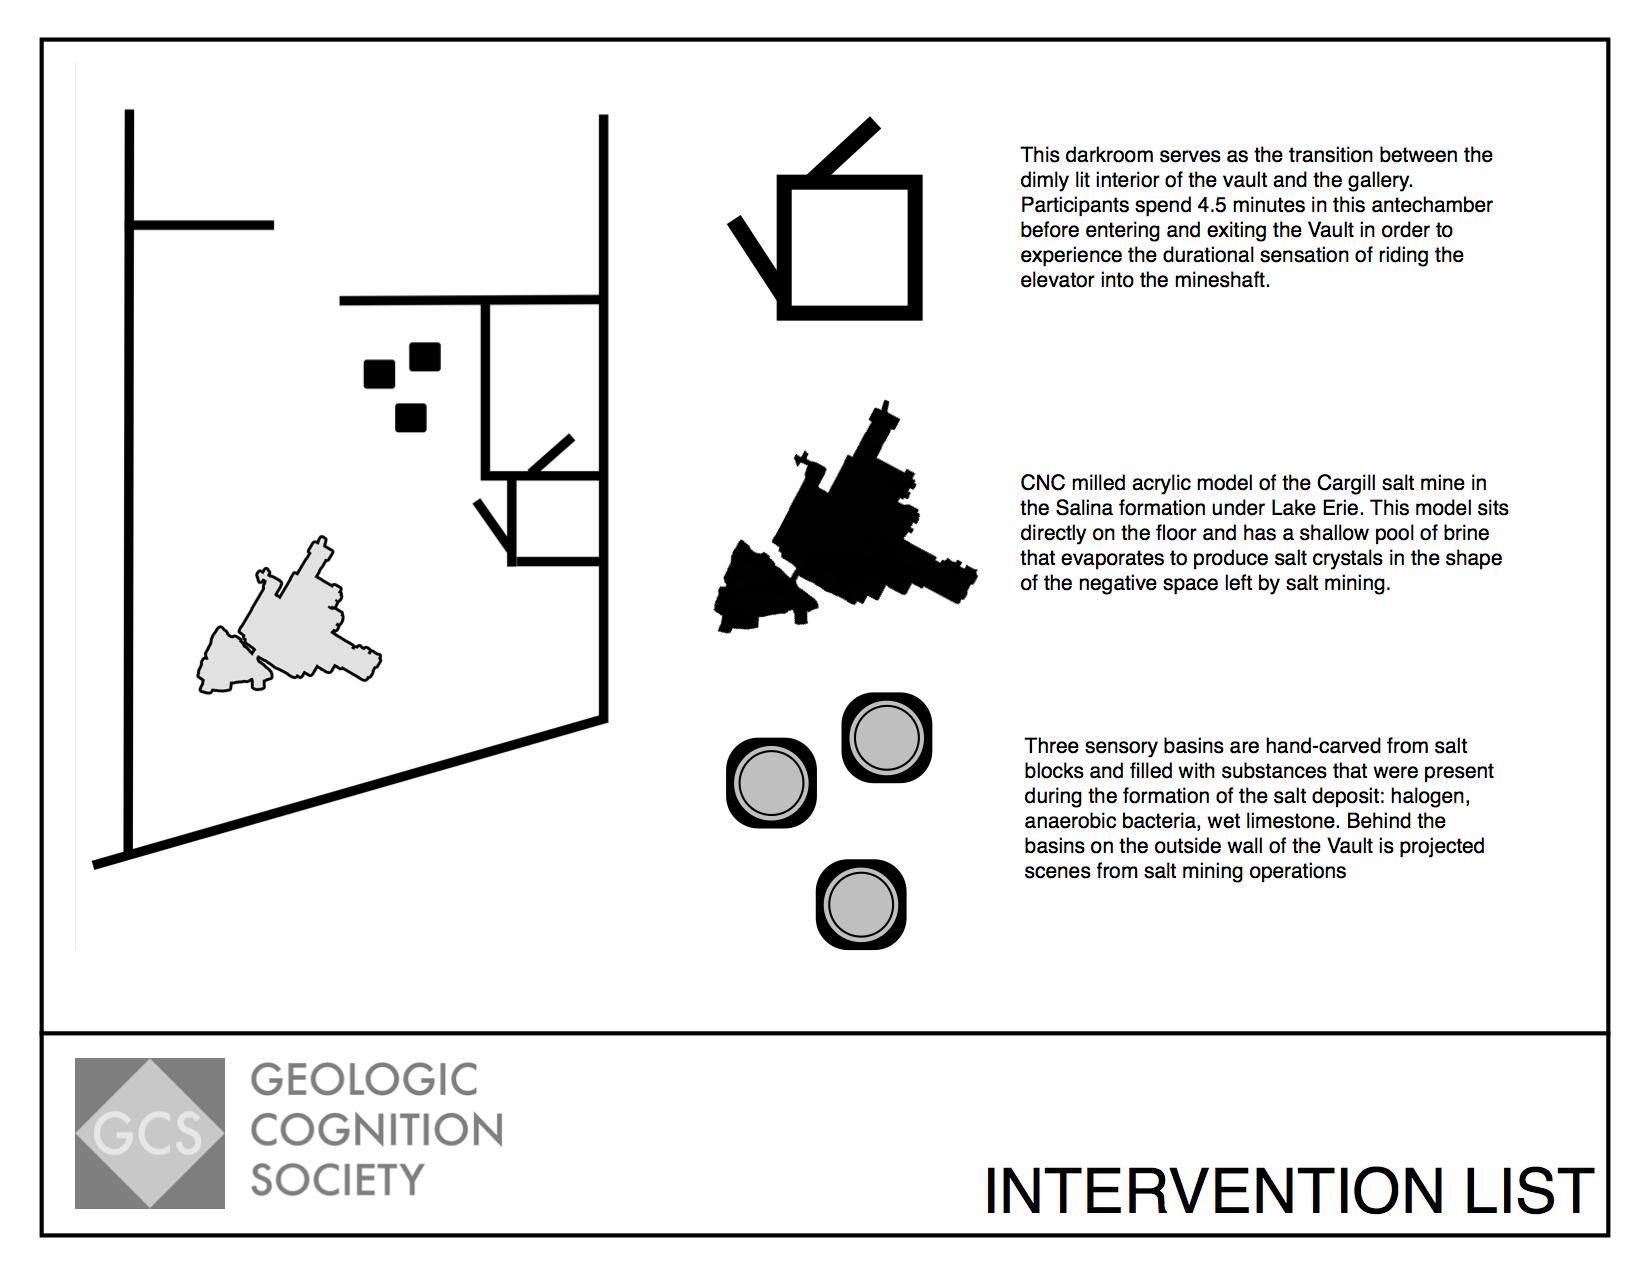 06-geologiccognitionsociety-interventionlist.jpg